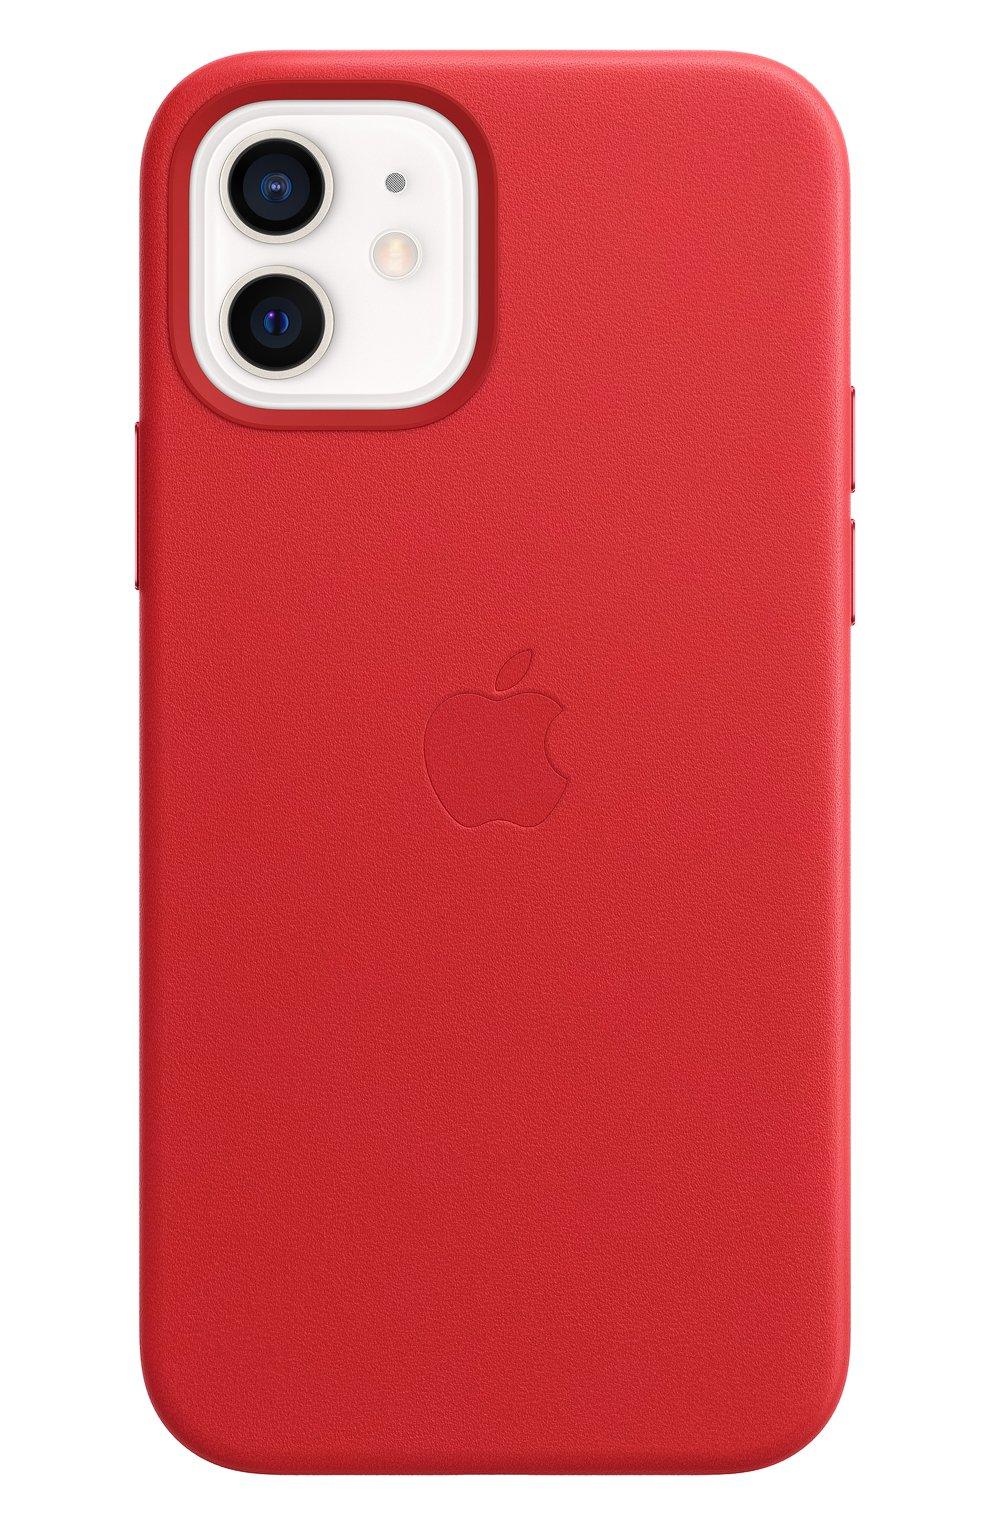 Чехол magsafe для iphone 12/12 pro APPLE  (product)red цвета, арт. MHKD3ZE/A | Фото 2